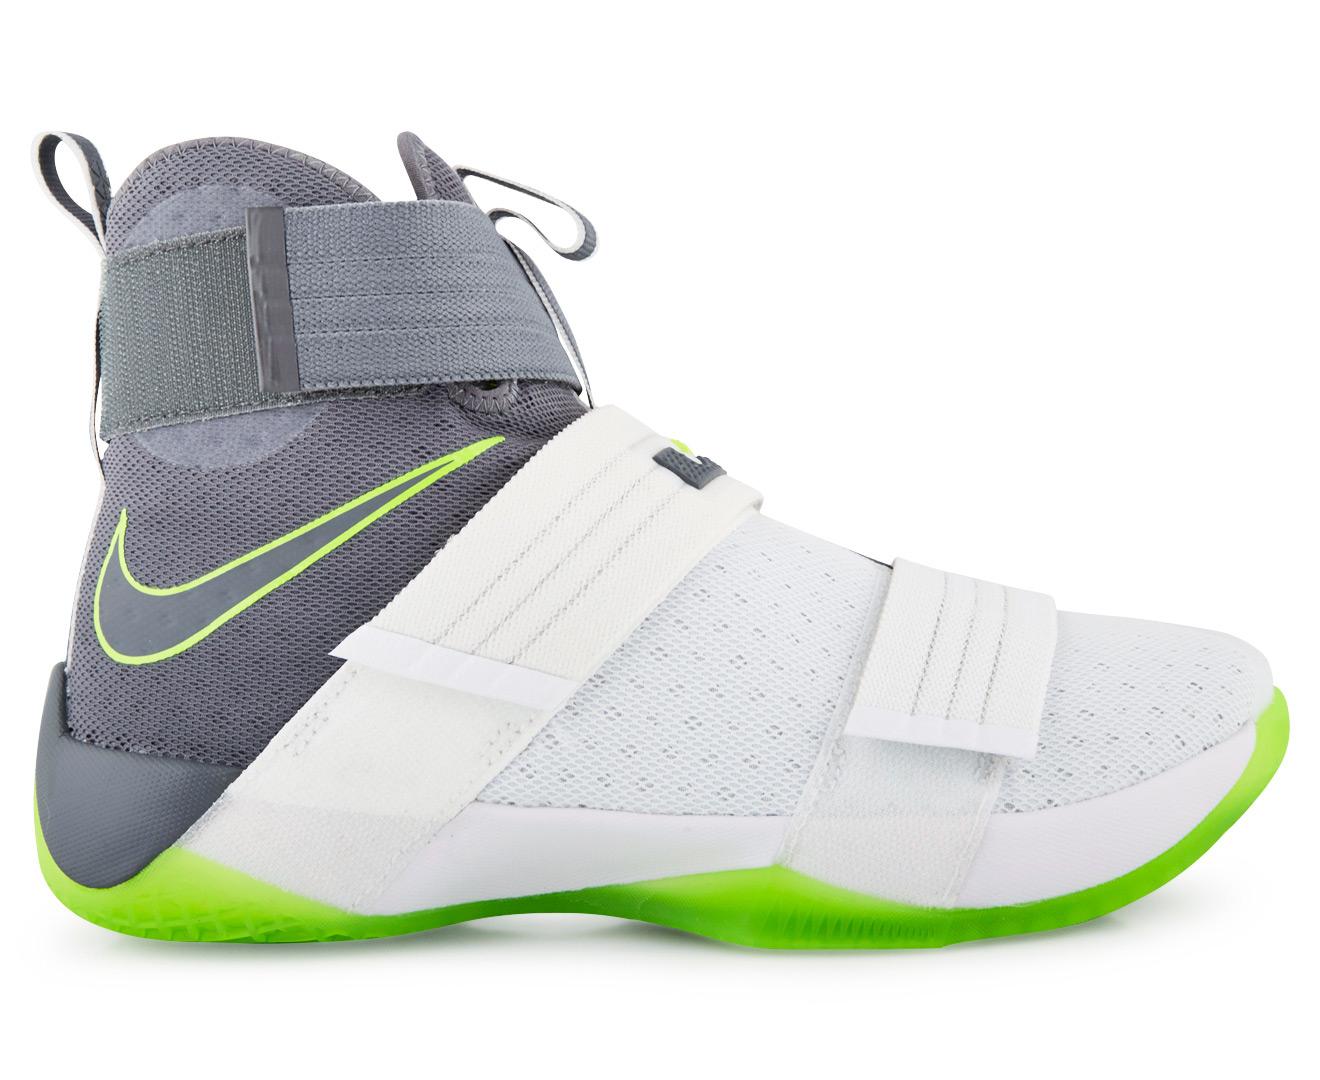 6ef90a0bd79 Nike Men s LeBron Soldier 10 SFG Basketball Shoe - White Cool Grey Electric  Green